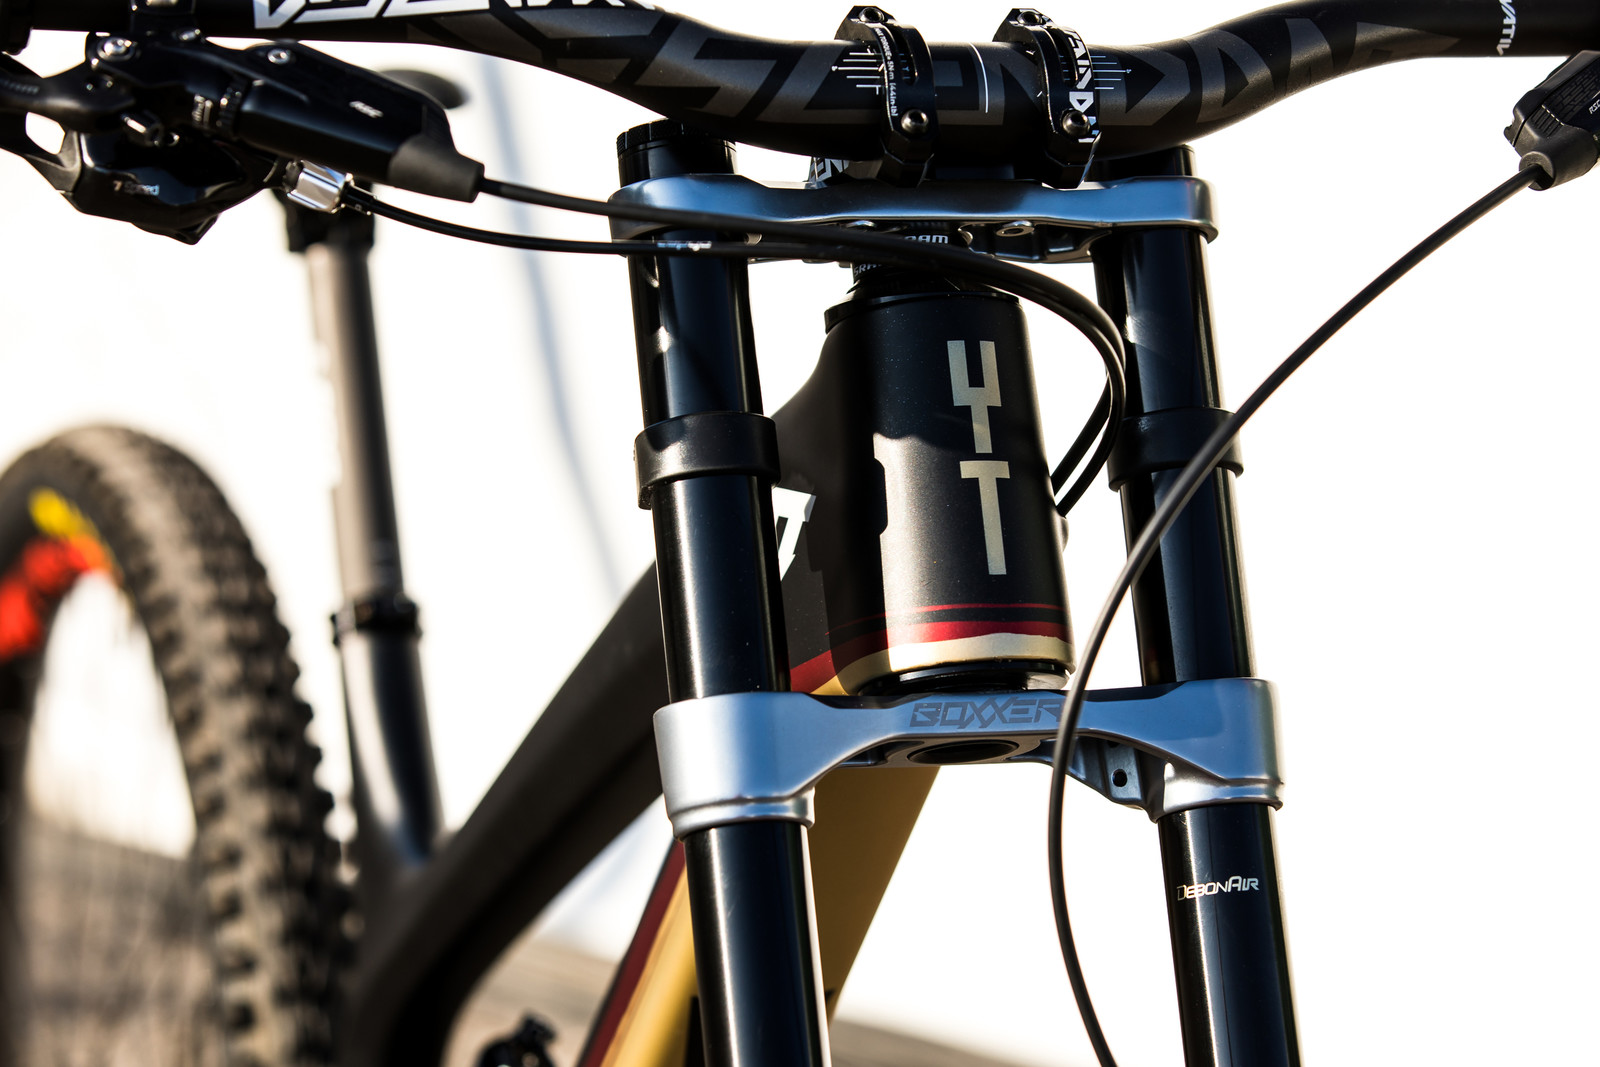 MSA19 BB020069 - Erik Irmisch's YT TUES at 2019 Worlds MSA - Mountain Biking Pictures - Vital MTB